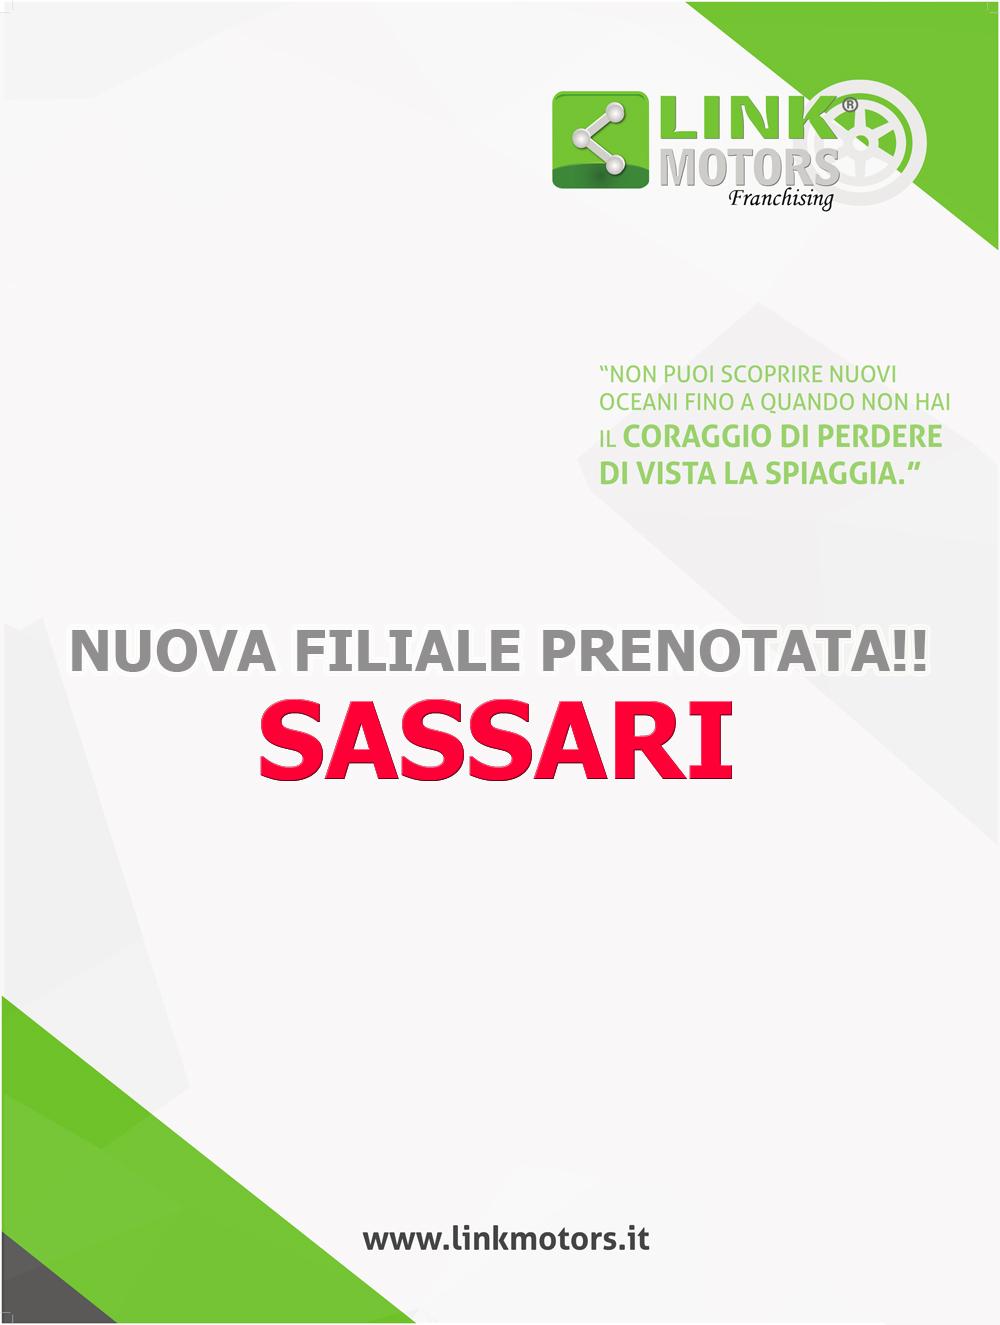 Link Motors - Sassari